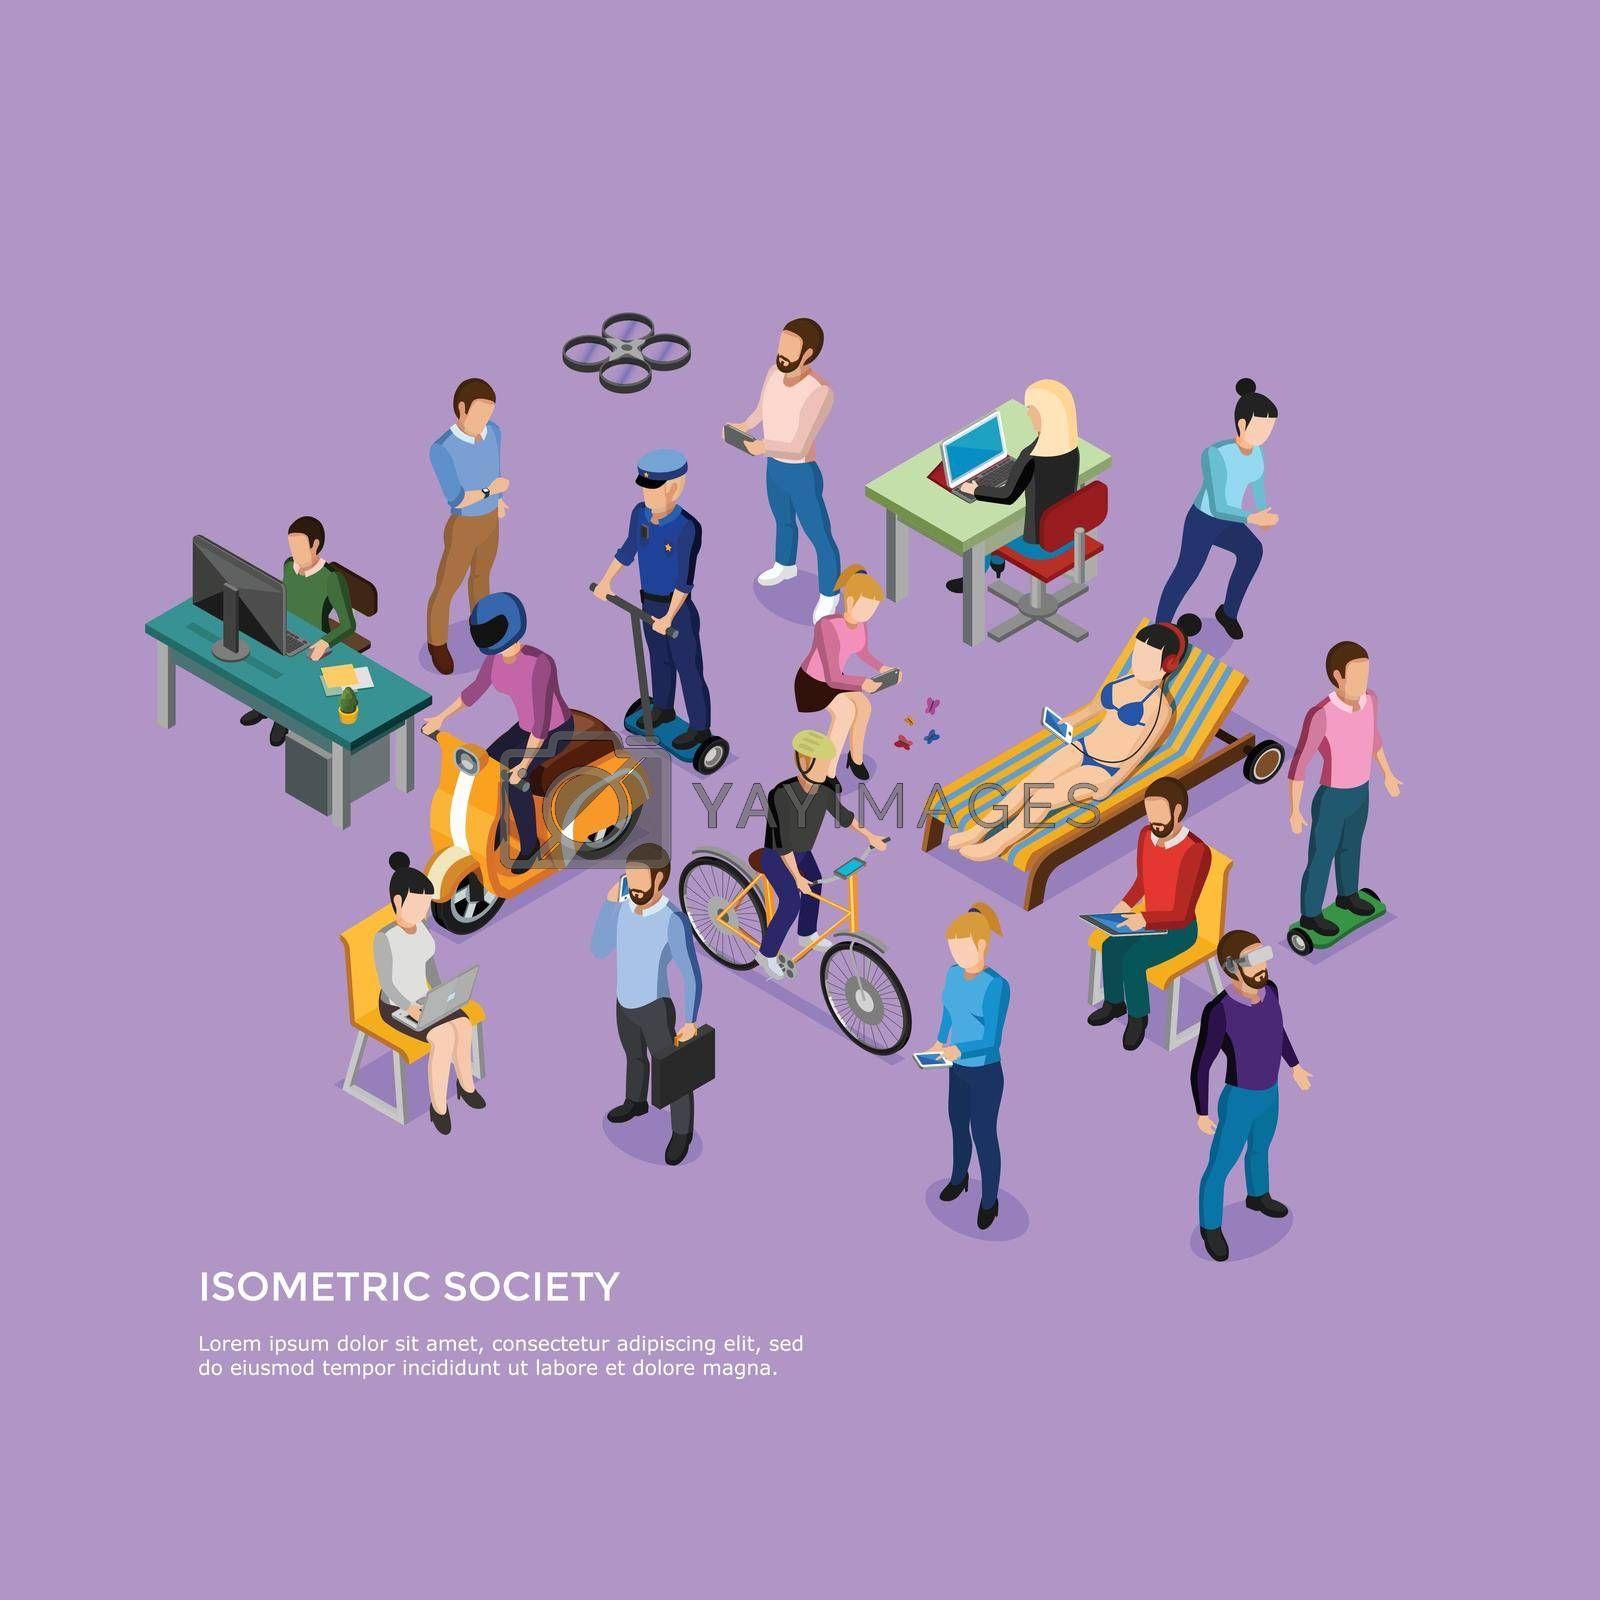 Royalty free image of Isometric People Society by mstjahanara